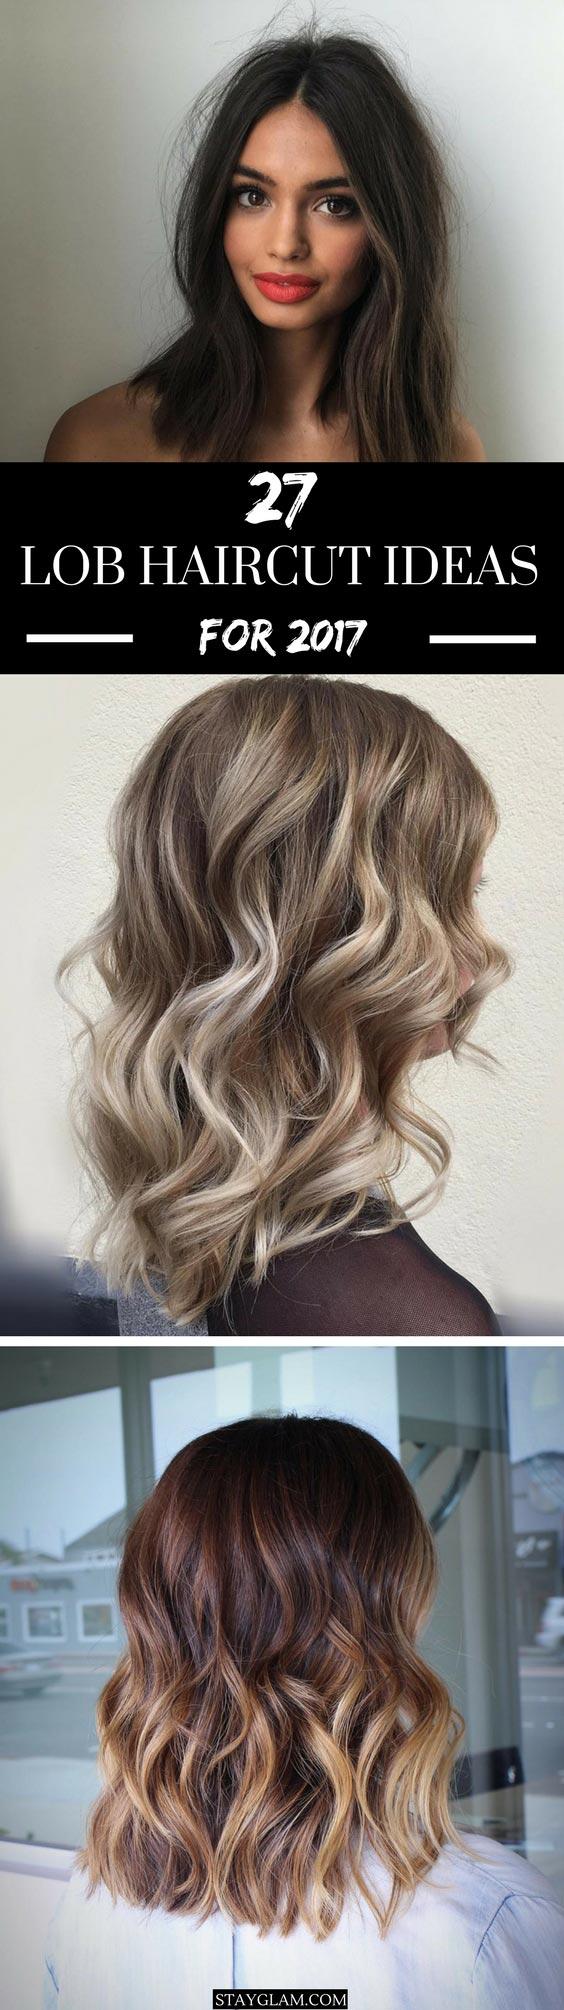 27 Pretty Lob Haircut Ideas You Should Copy In 2017 Stayglam